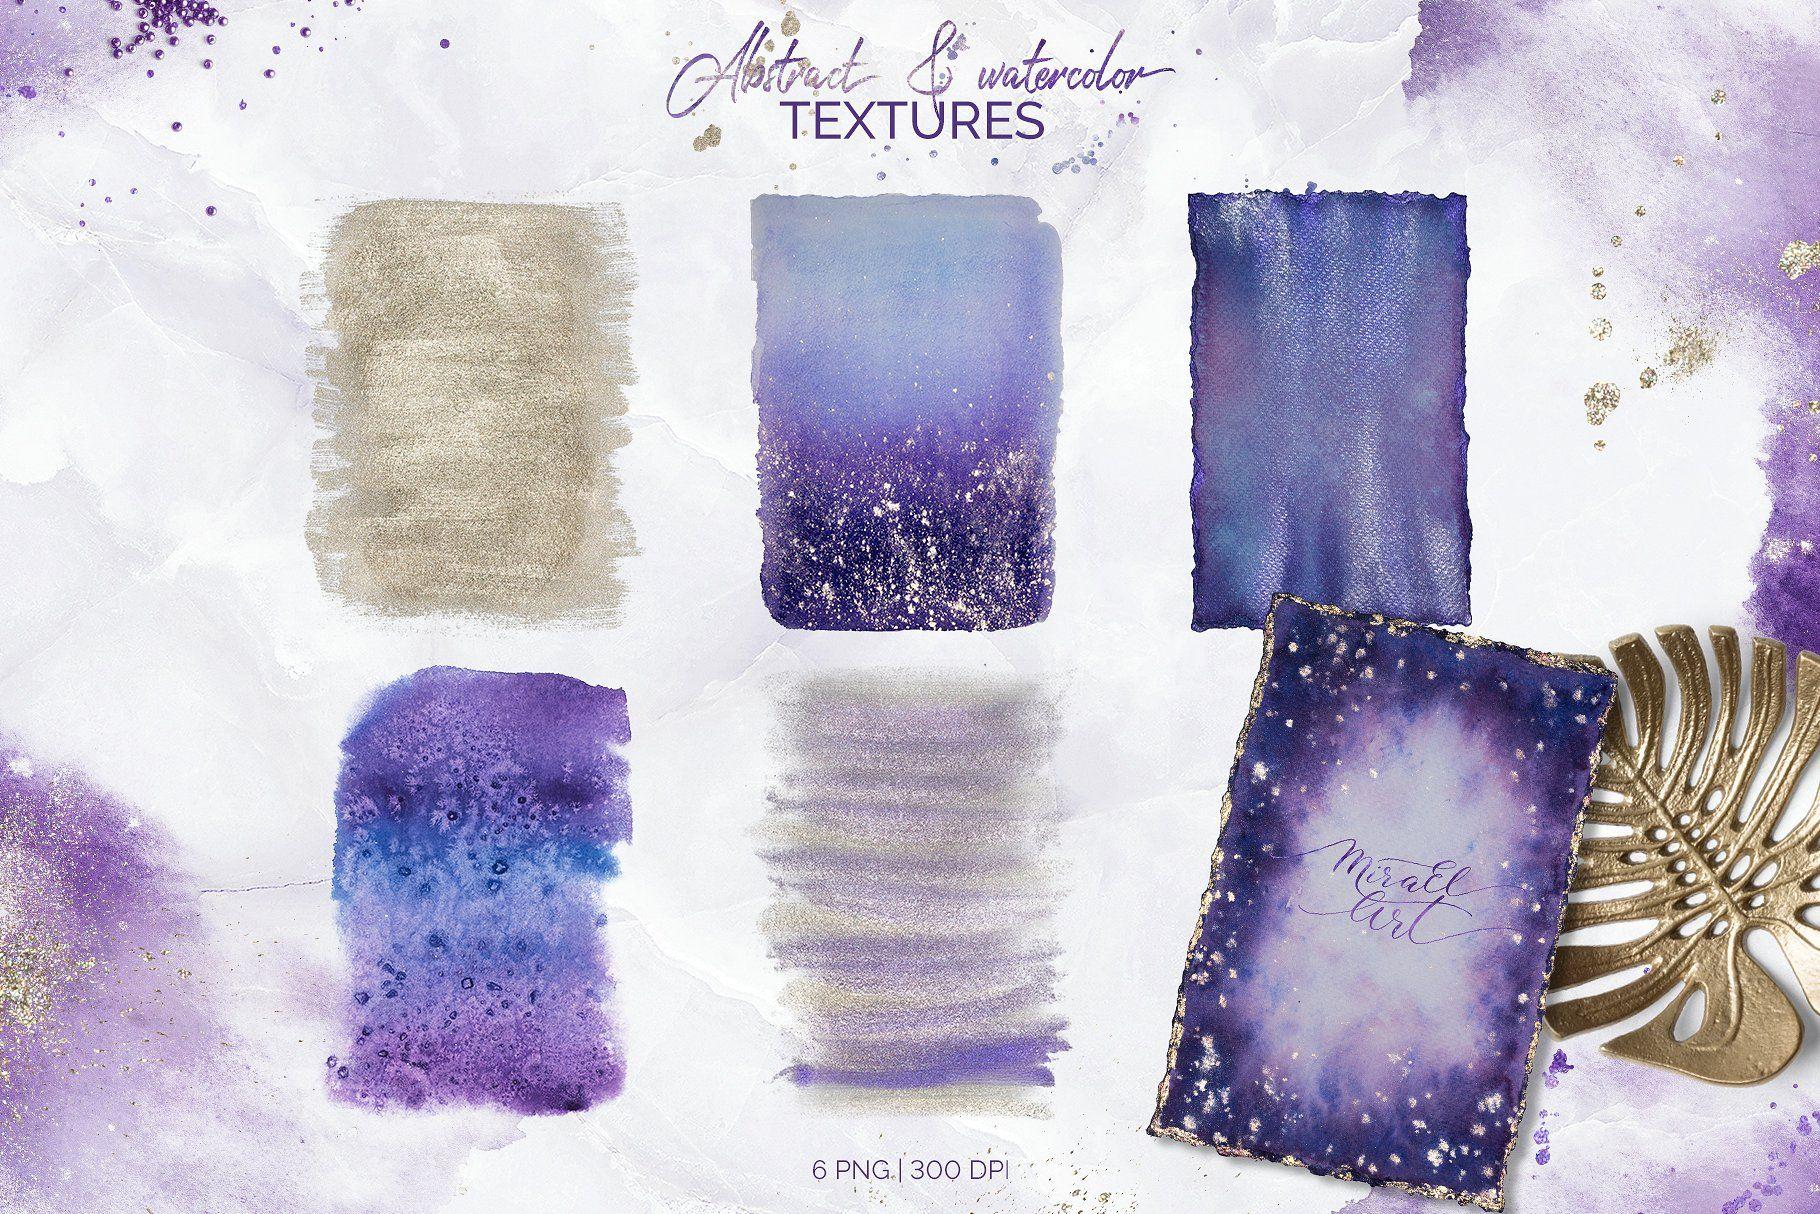 Violet Aura Watercolor Design Kit Violet Aura Watercolor Design Watercolor Splash Png